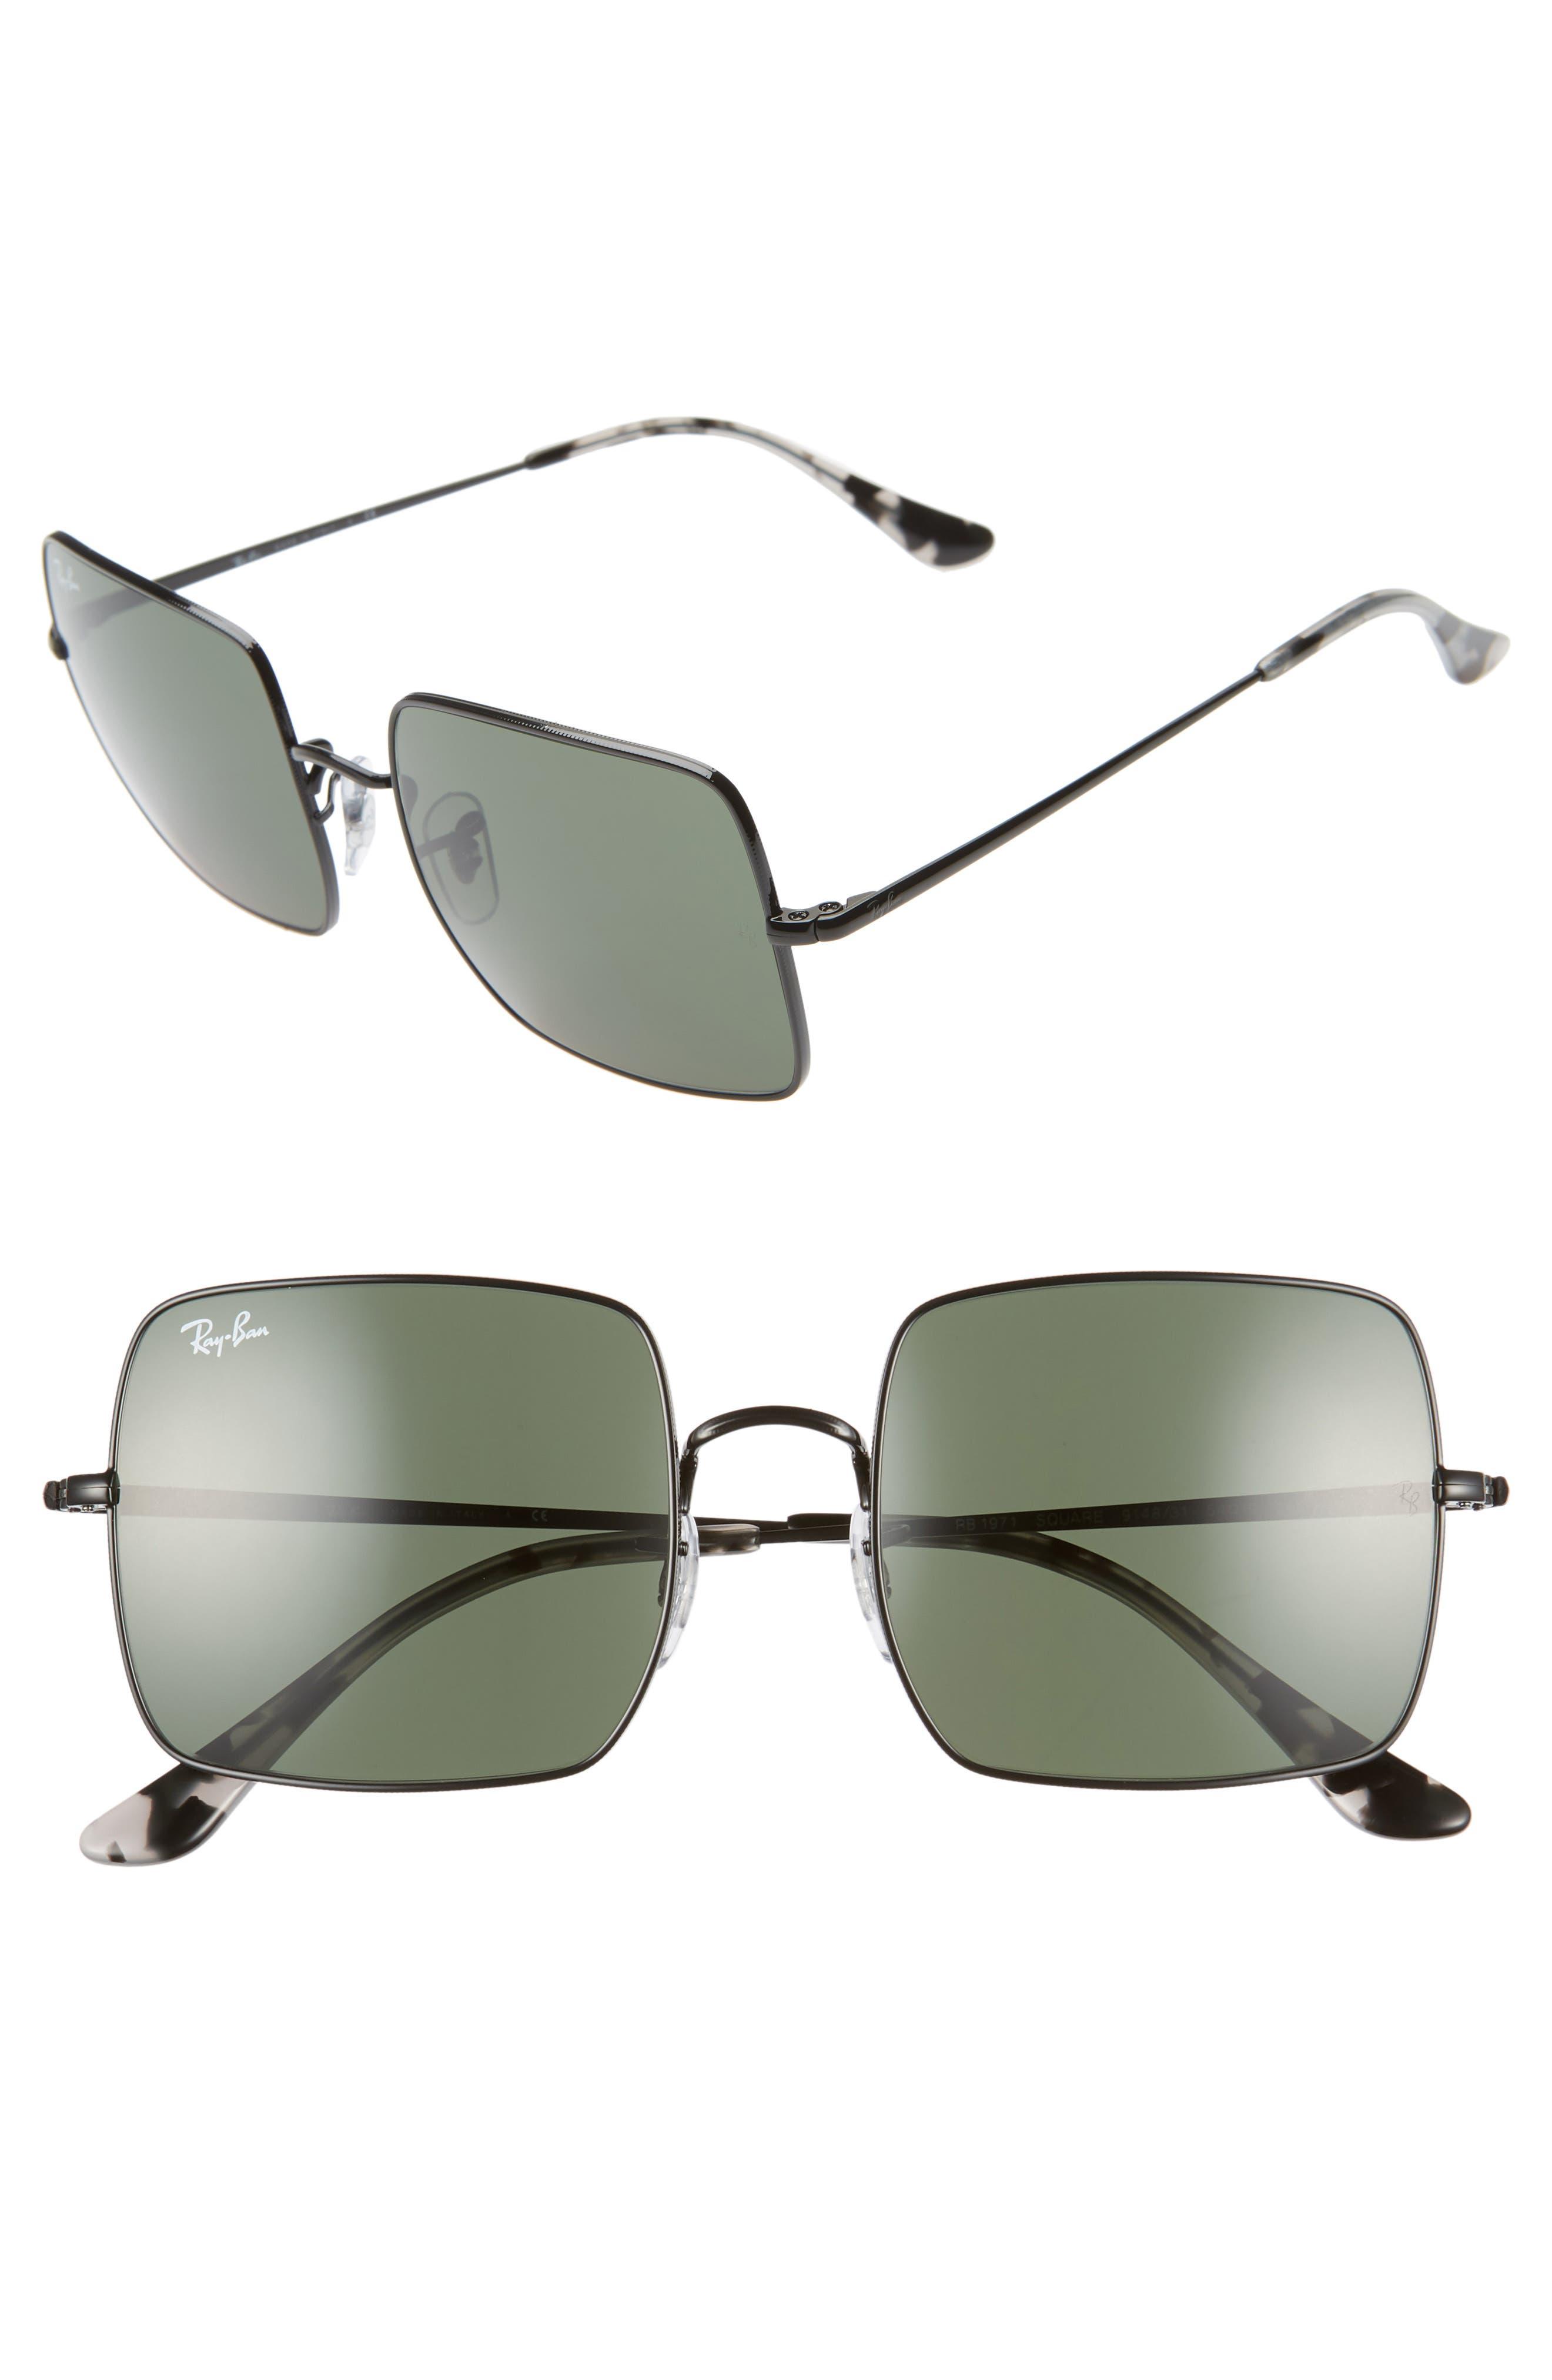 Ray-Ban 5m Square Sunglasses - Black/ Black Solid